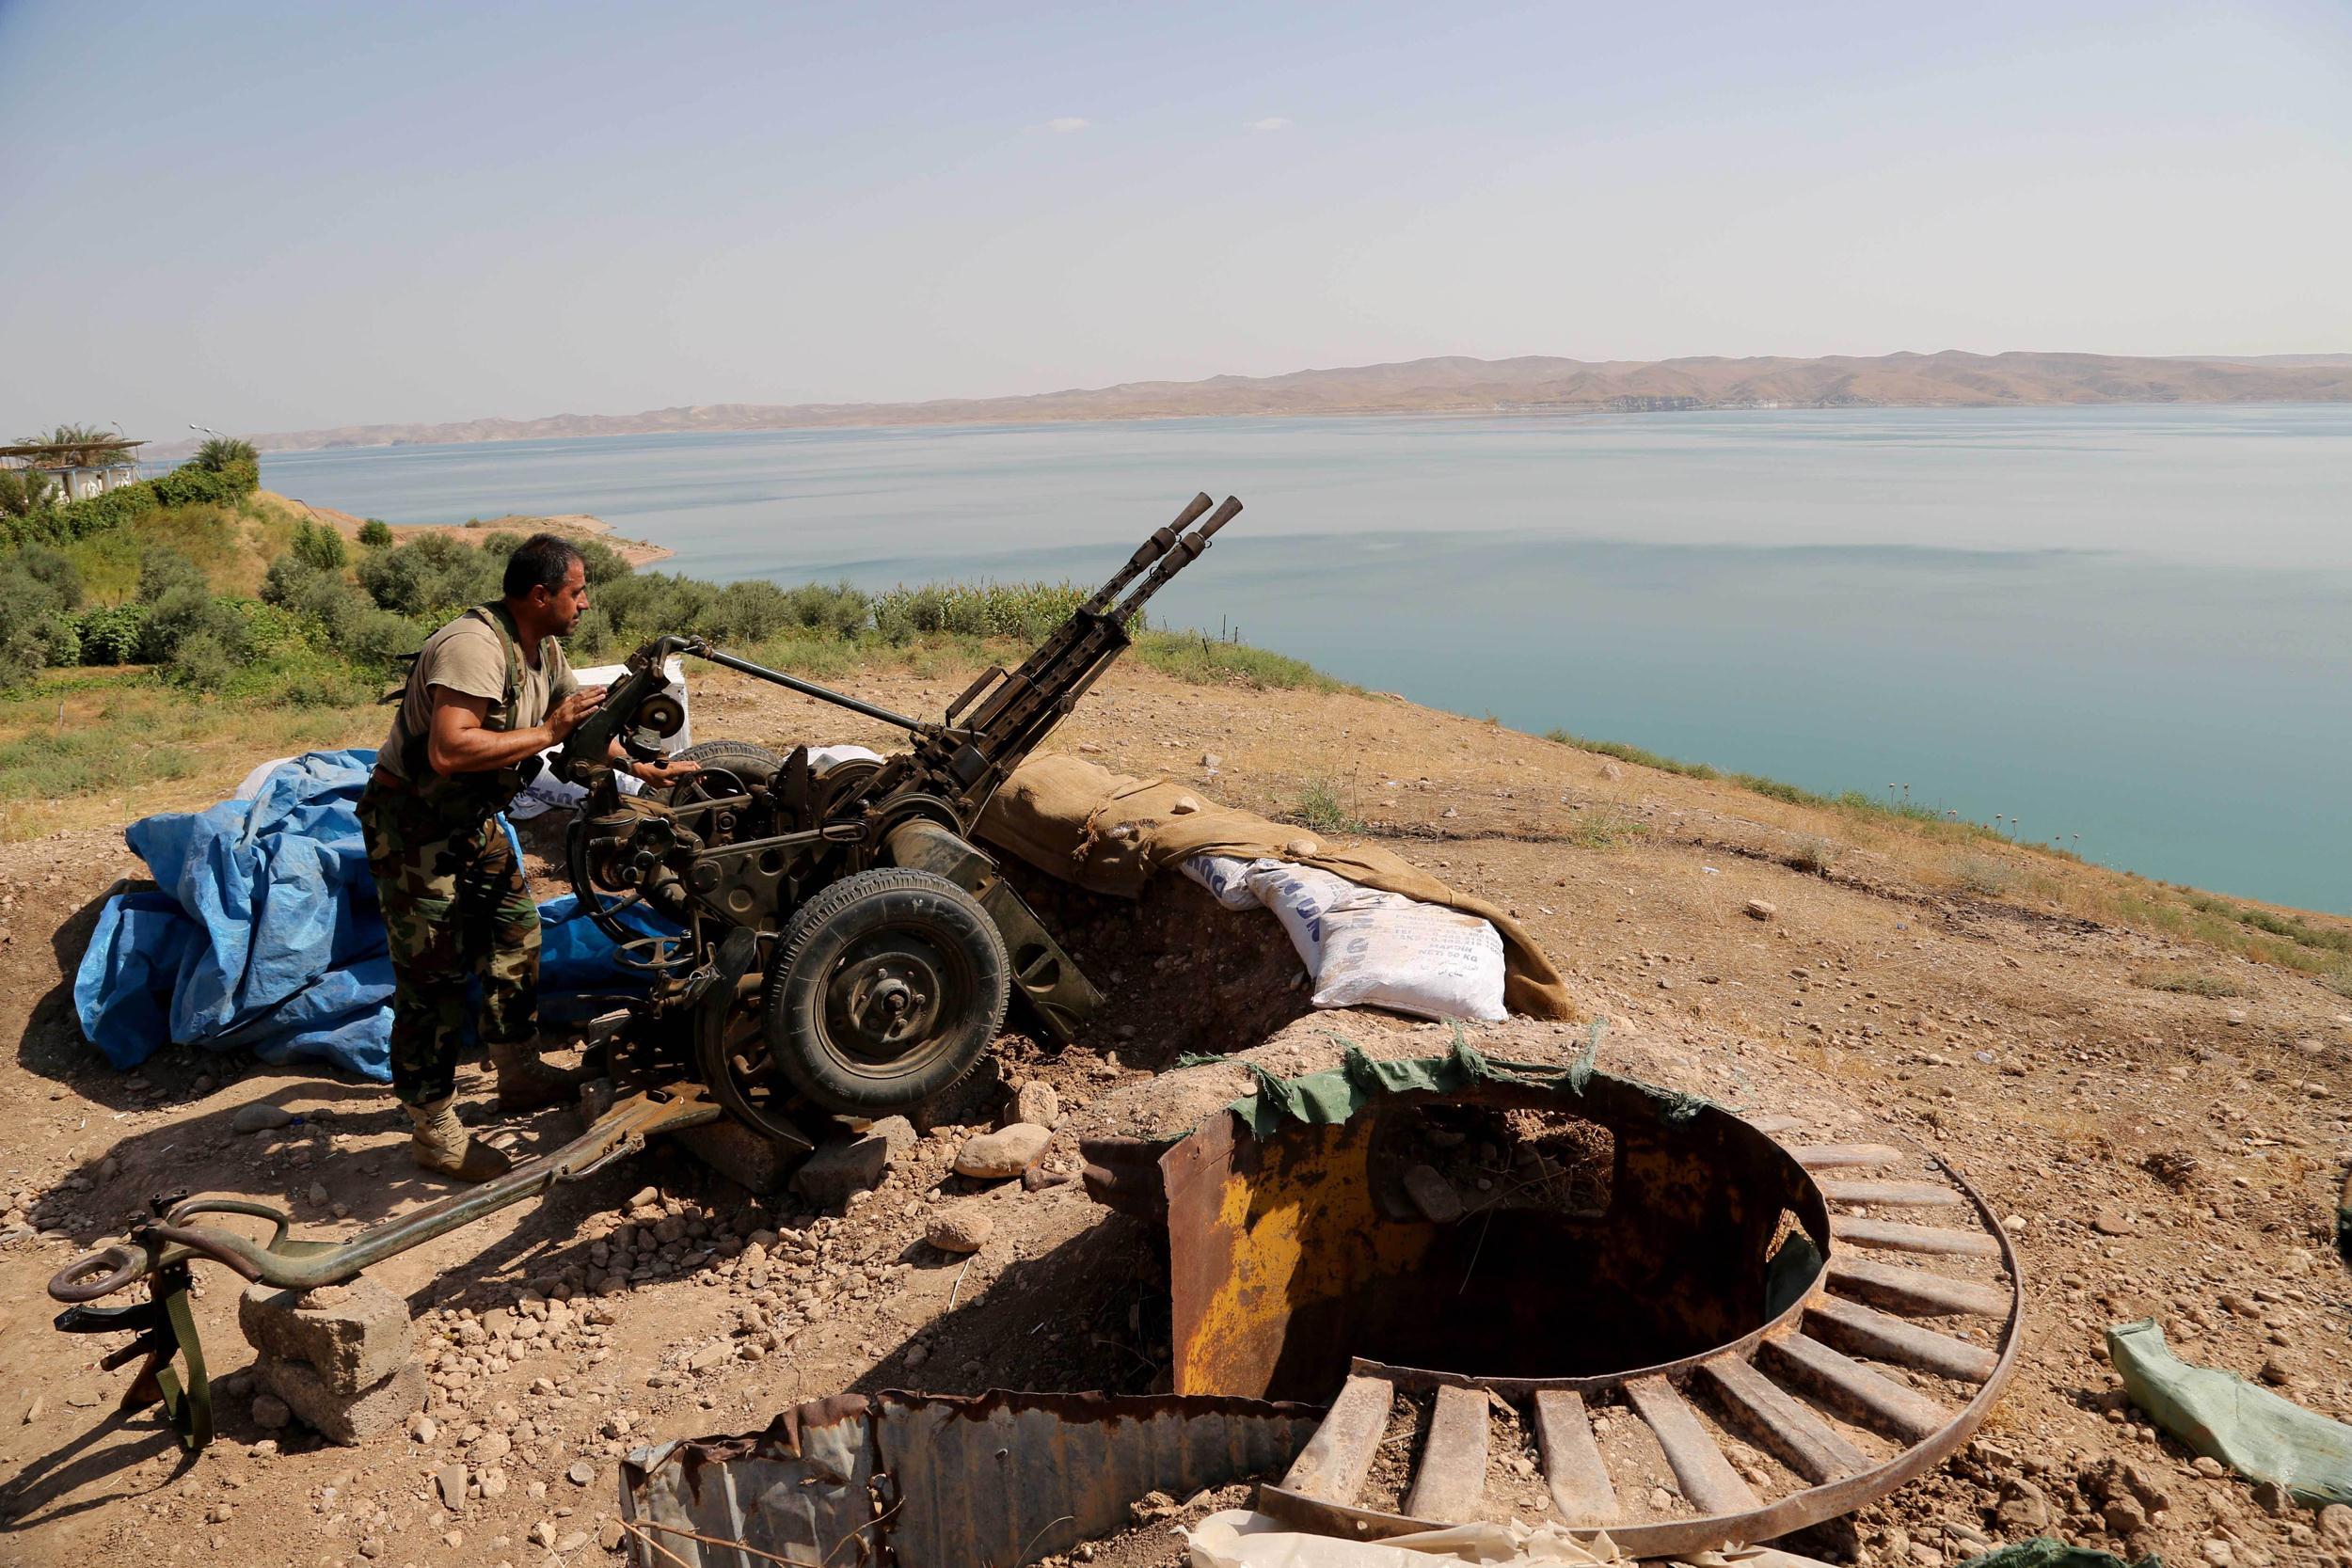 Image: A Kurdish peshmerga fighter prepares his weapon at his combat position near the Mosul Dam